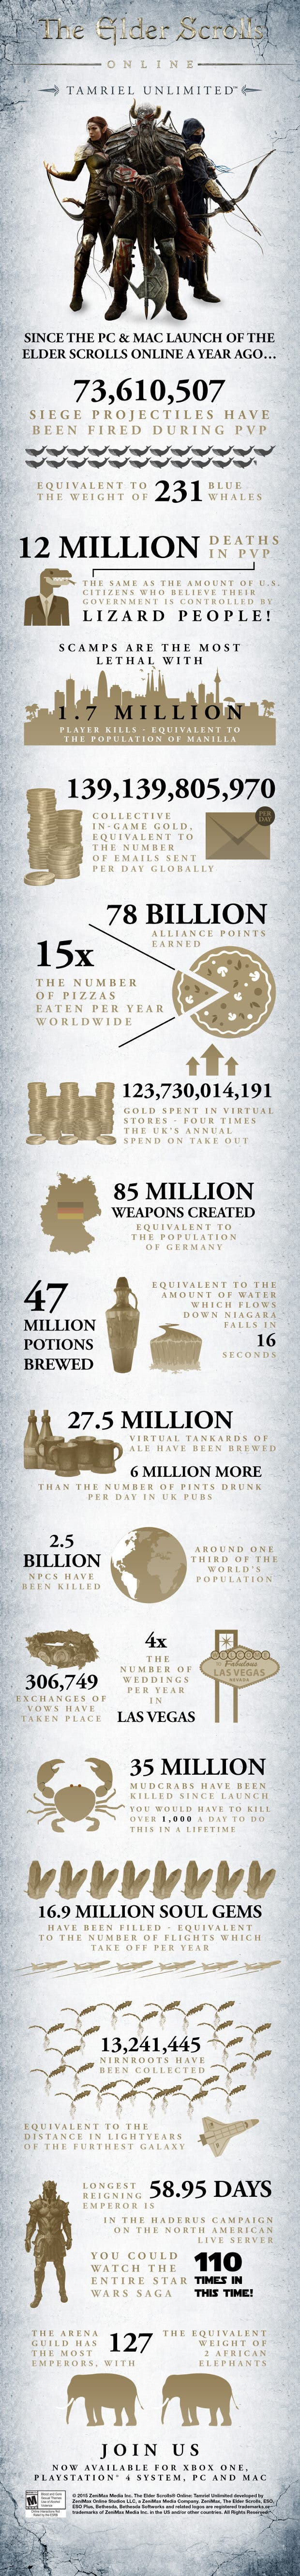 Infografía_The_Elder_Scrolls_Online1